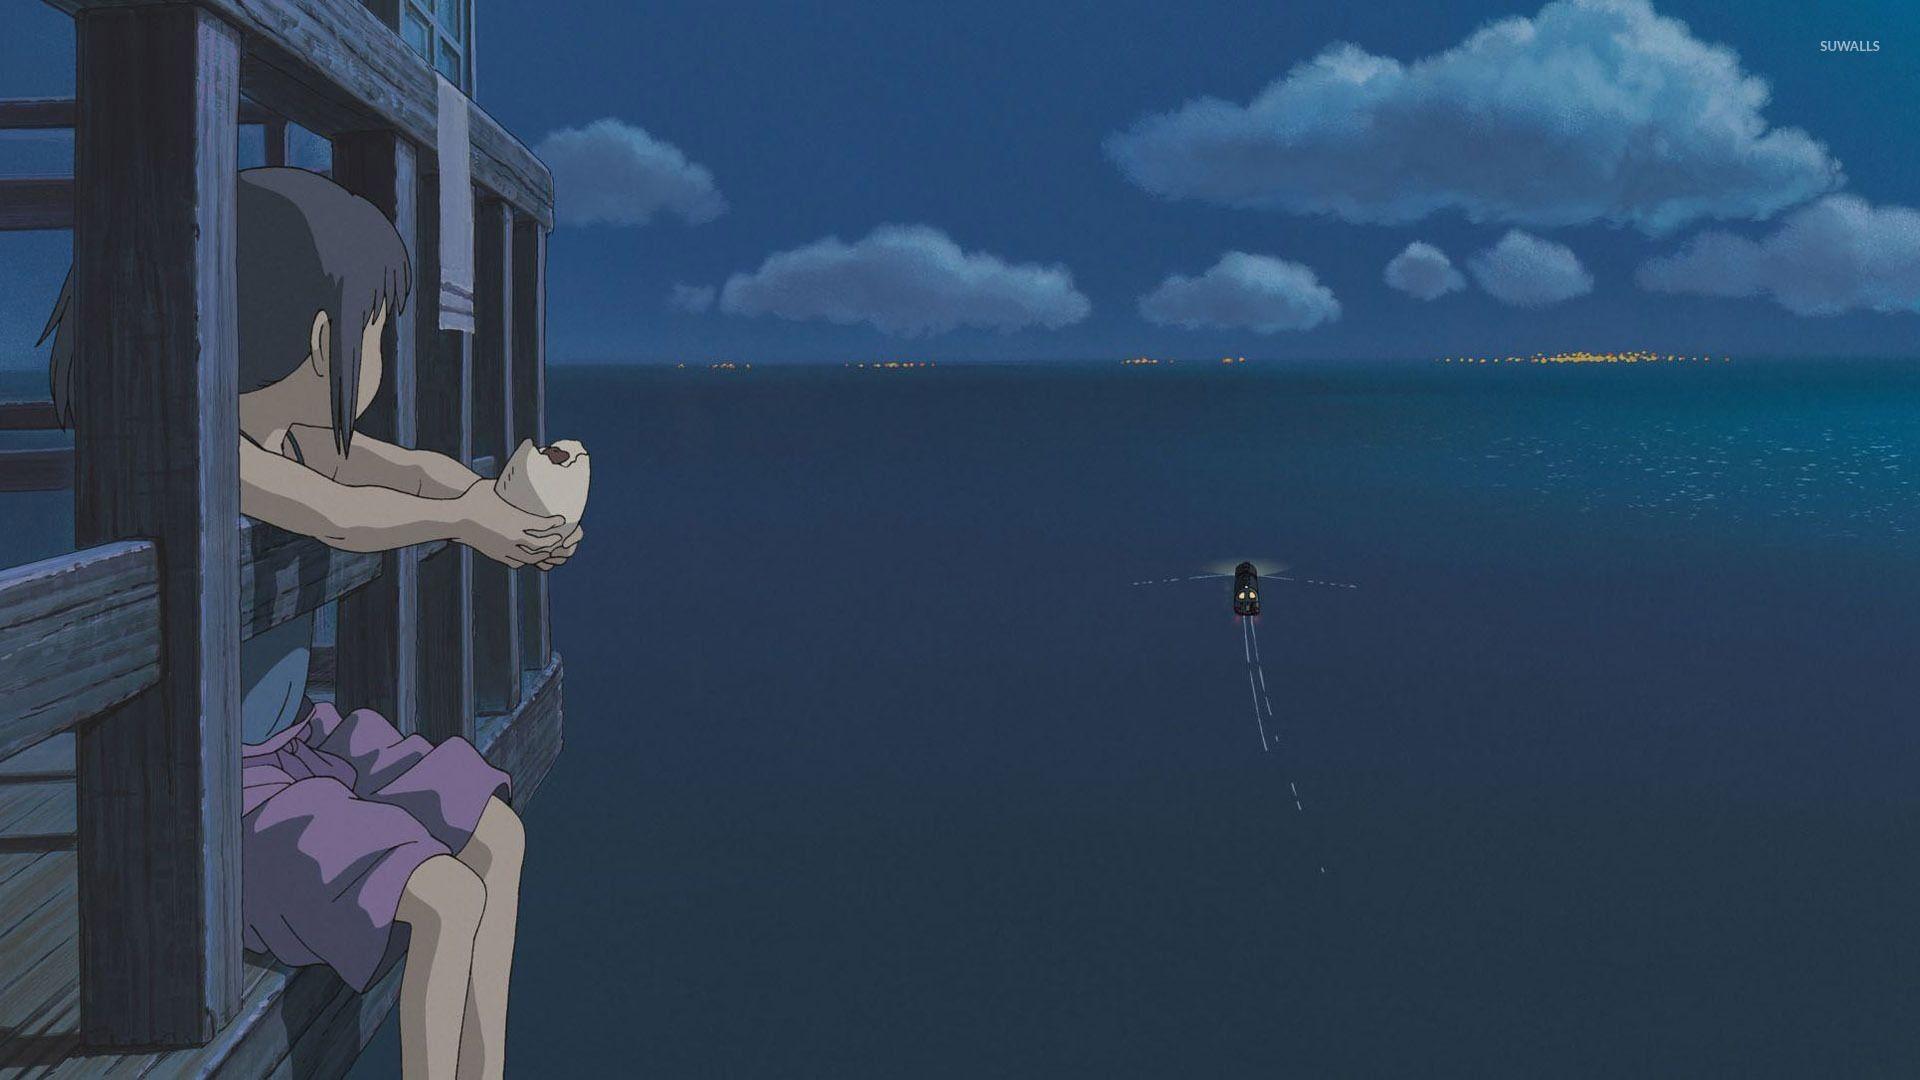 Unique Studio Ghibli Desktop Wallpaper In 2020 Spirited Away Wallpaper Anime Scenery Wallpaper Aesthetic Desktop Wallpaper